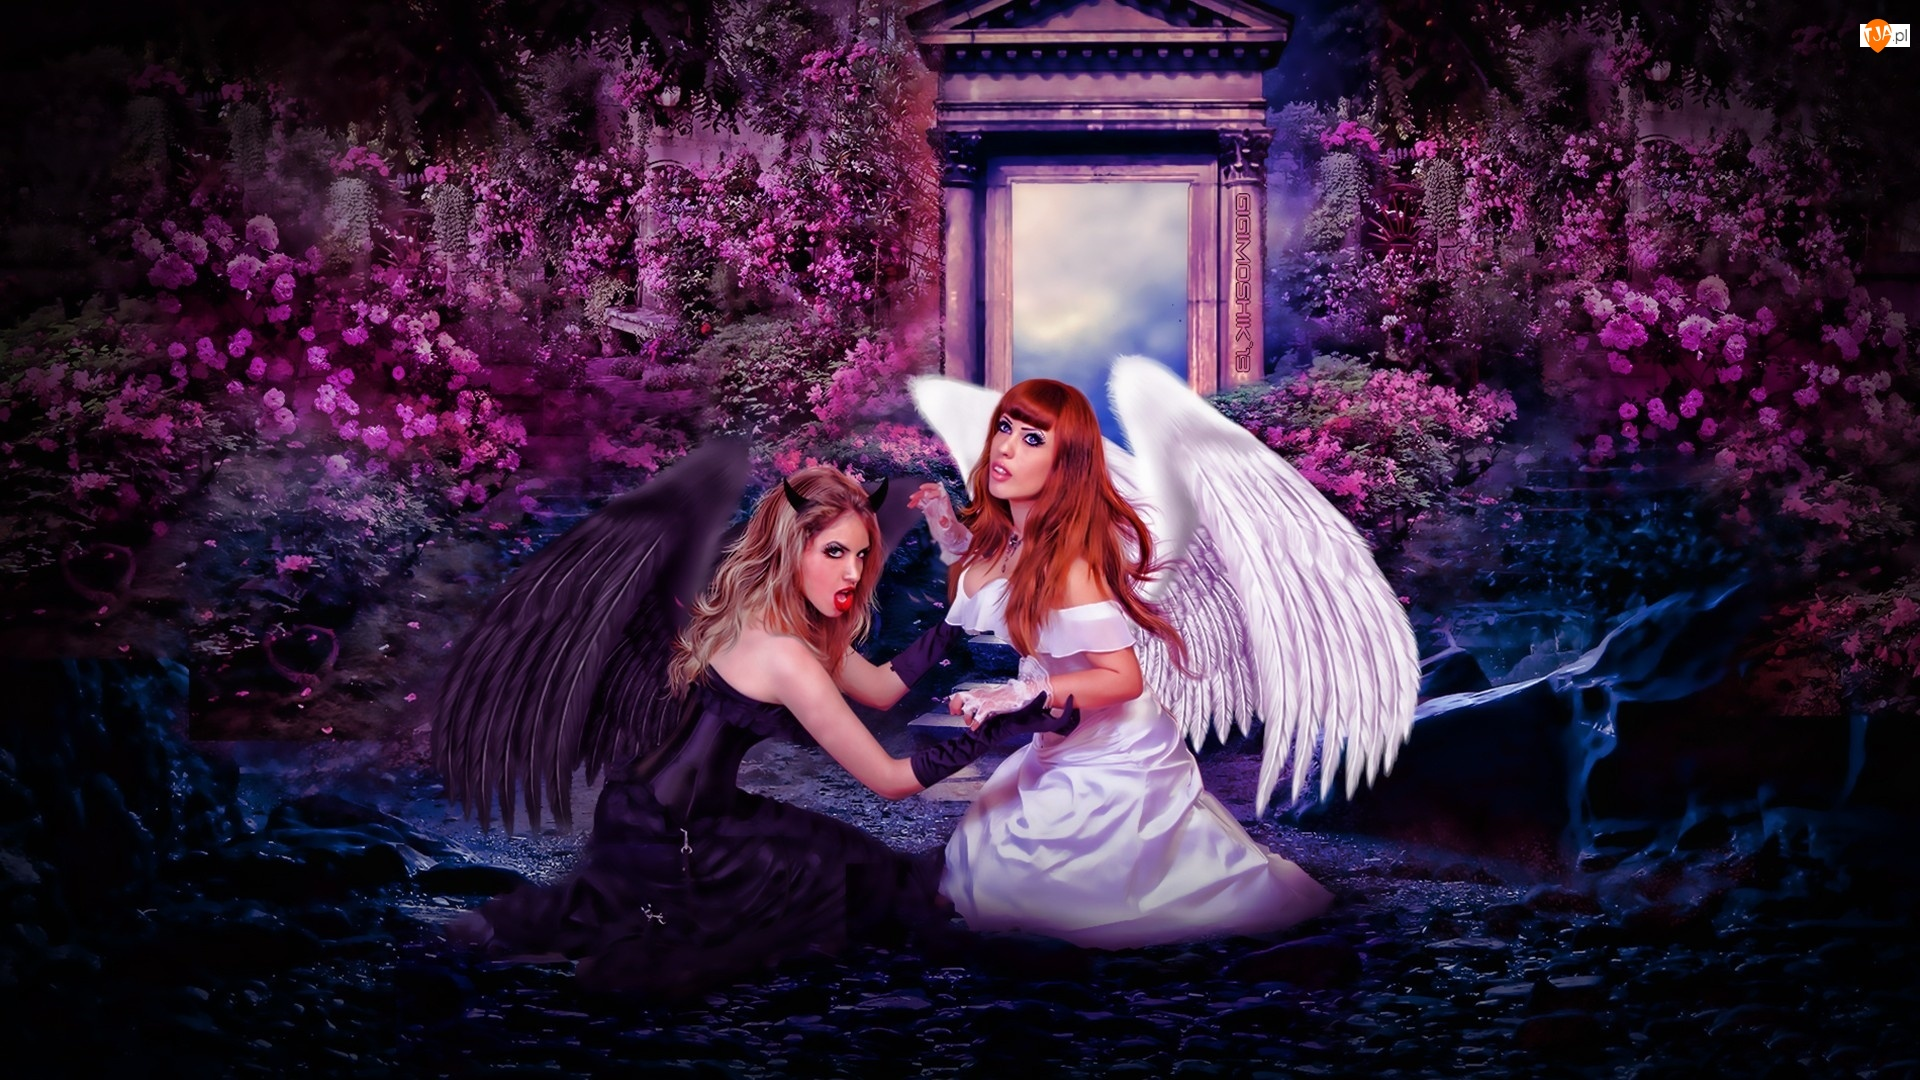 Kobiety, Walka, Anioł, Diablica